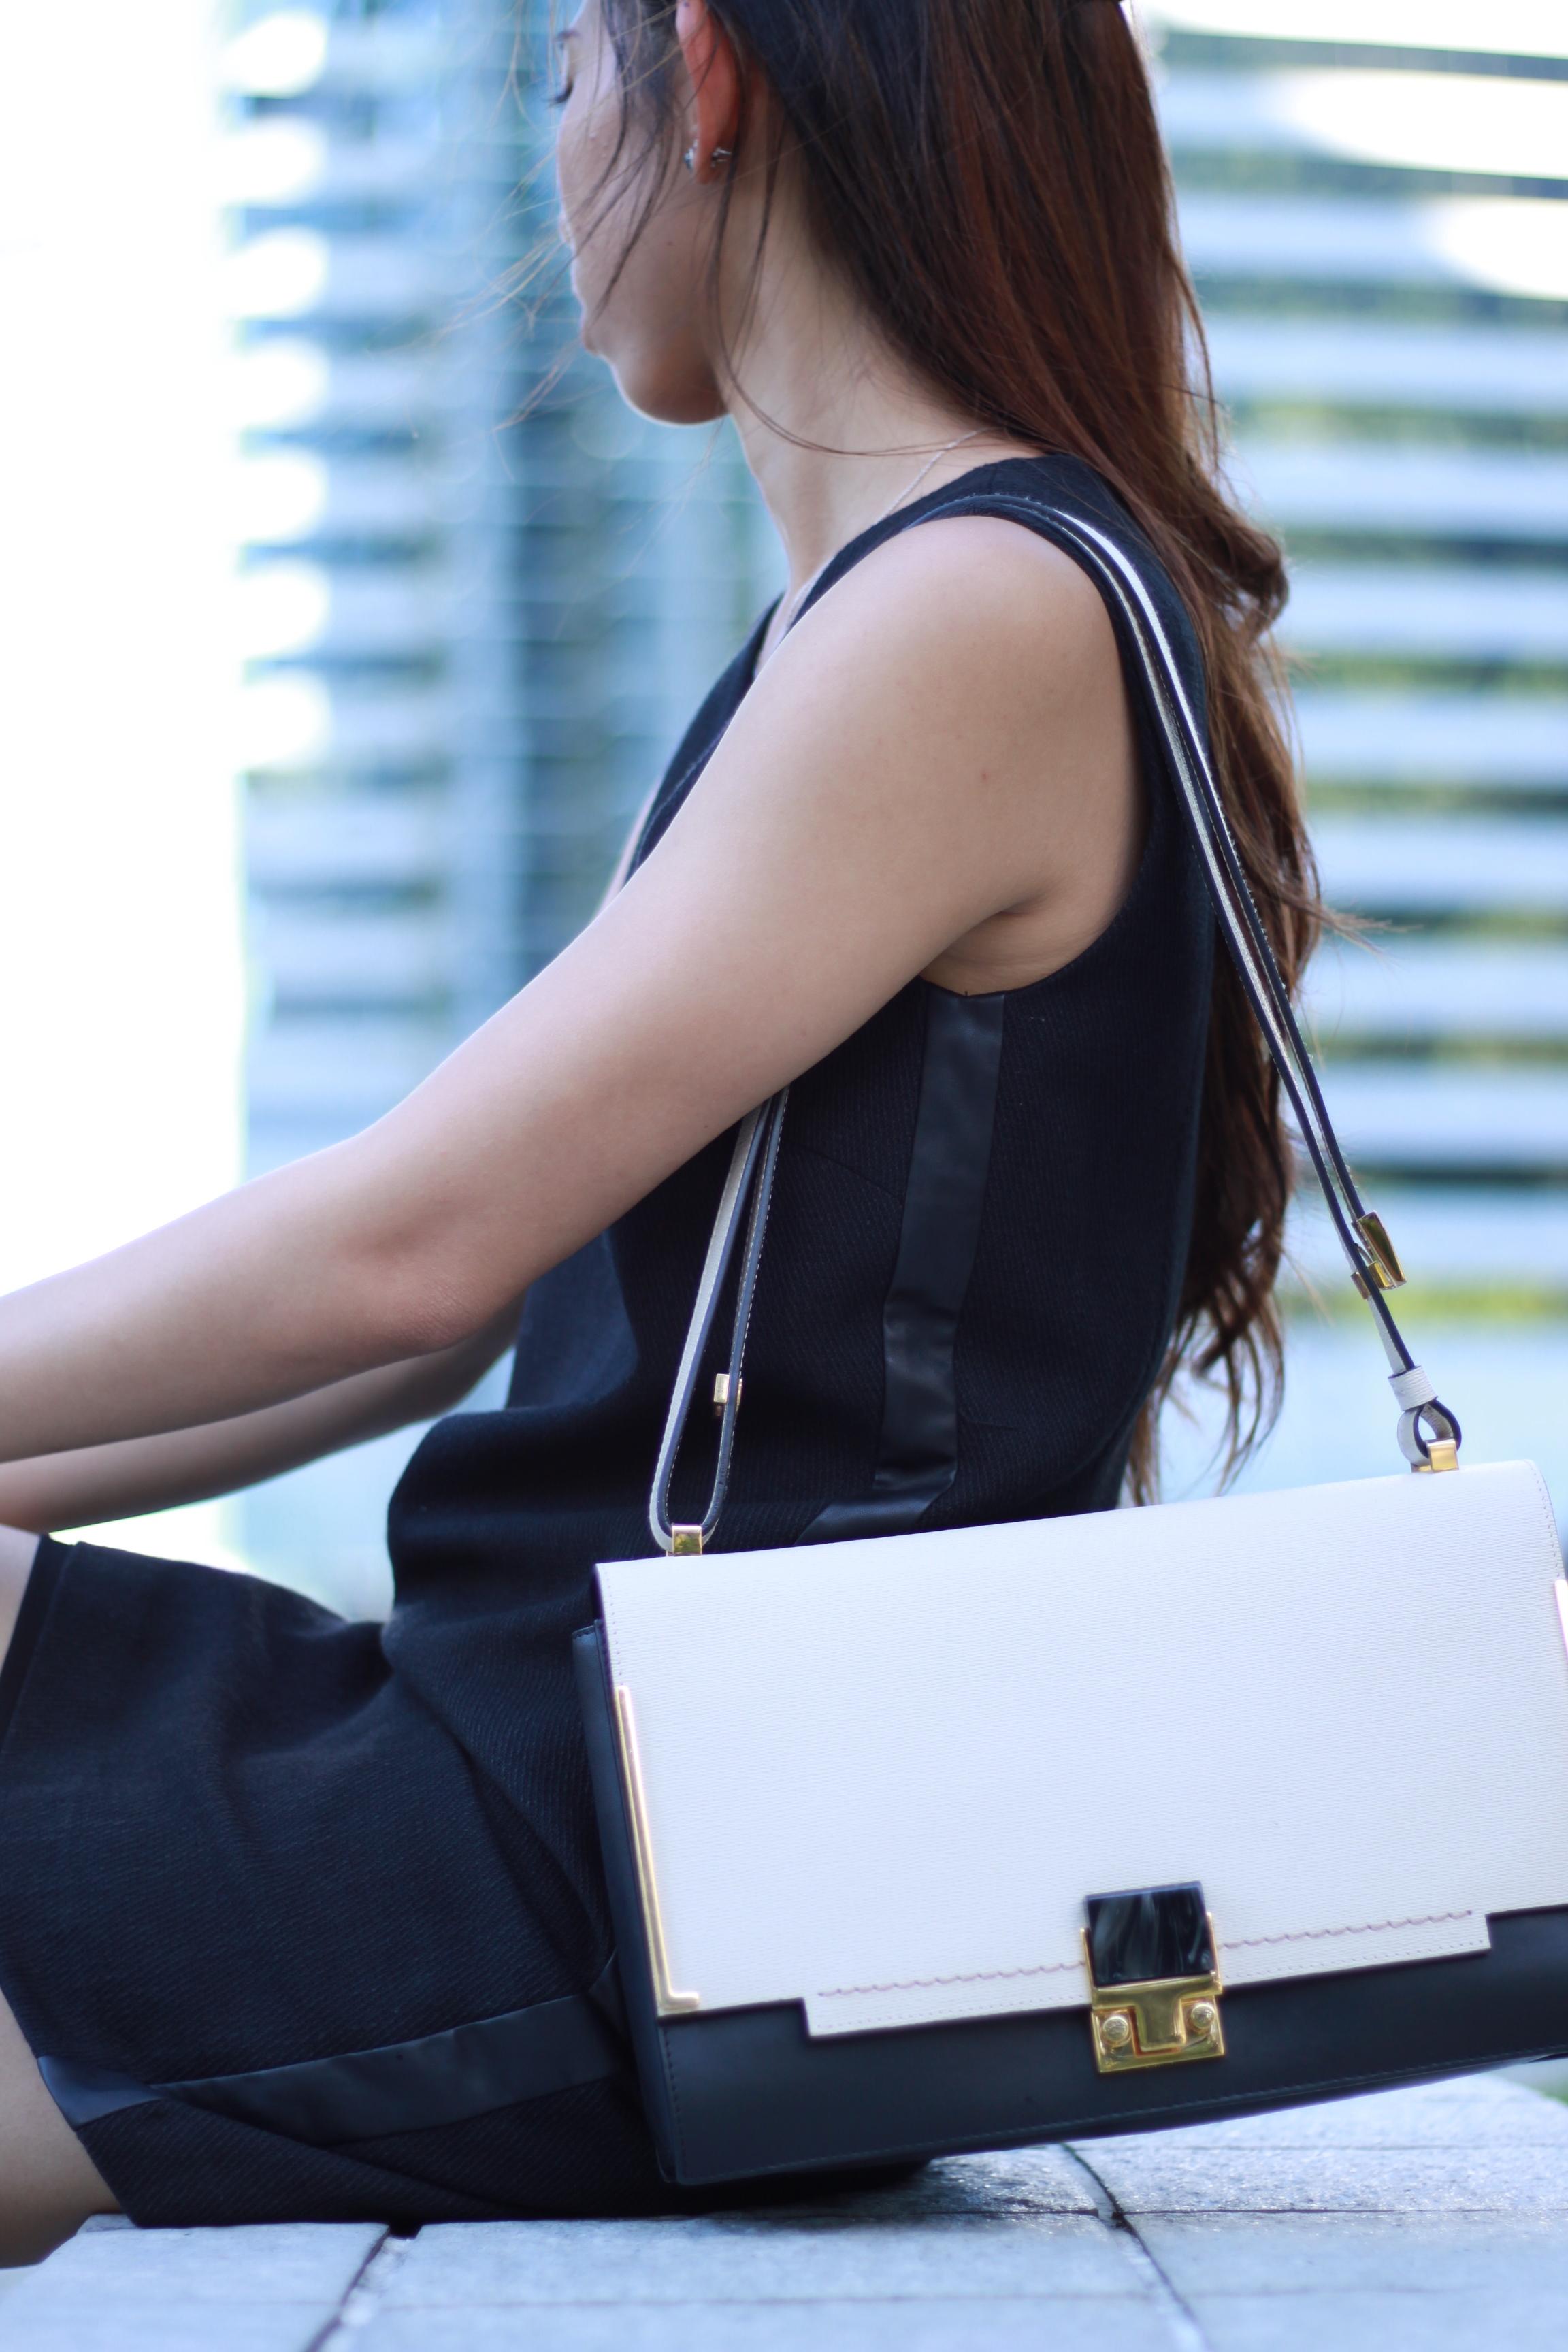 Black dress /  Zara  black pumps /  Lanvin  Partitian Two-tone shoulder bag